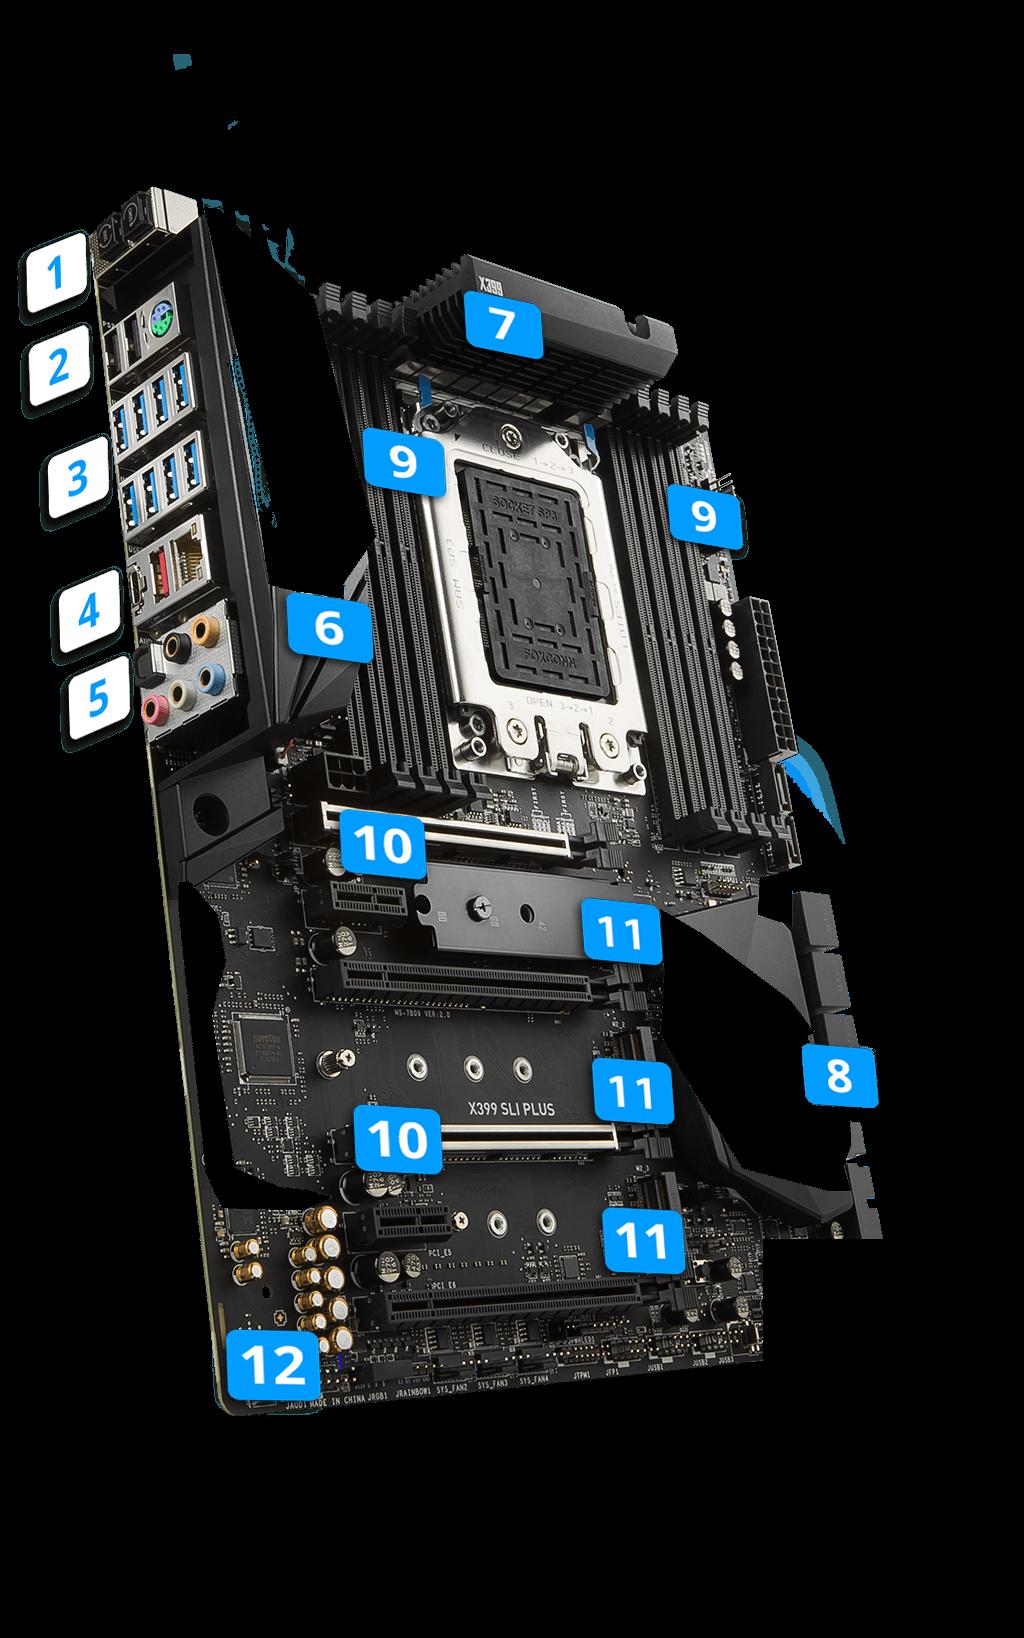 x399 sli plus motherboard the world leader in motherboard design